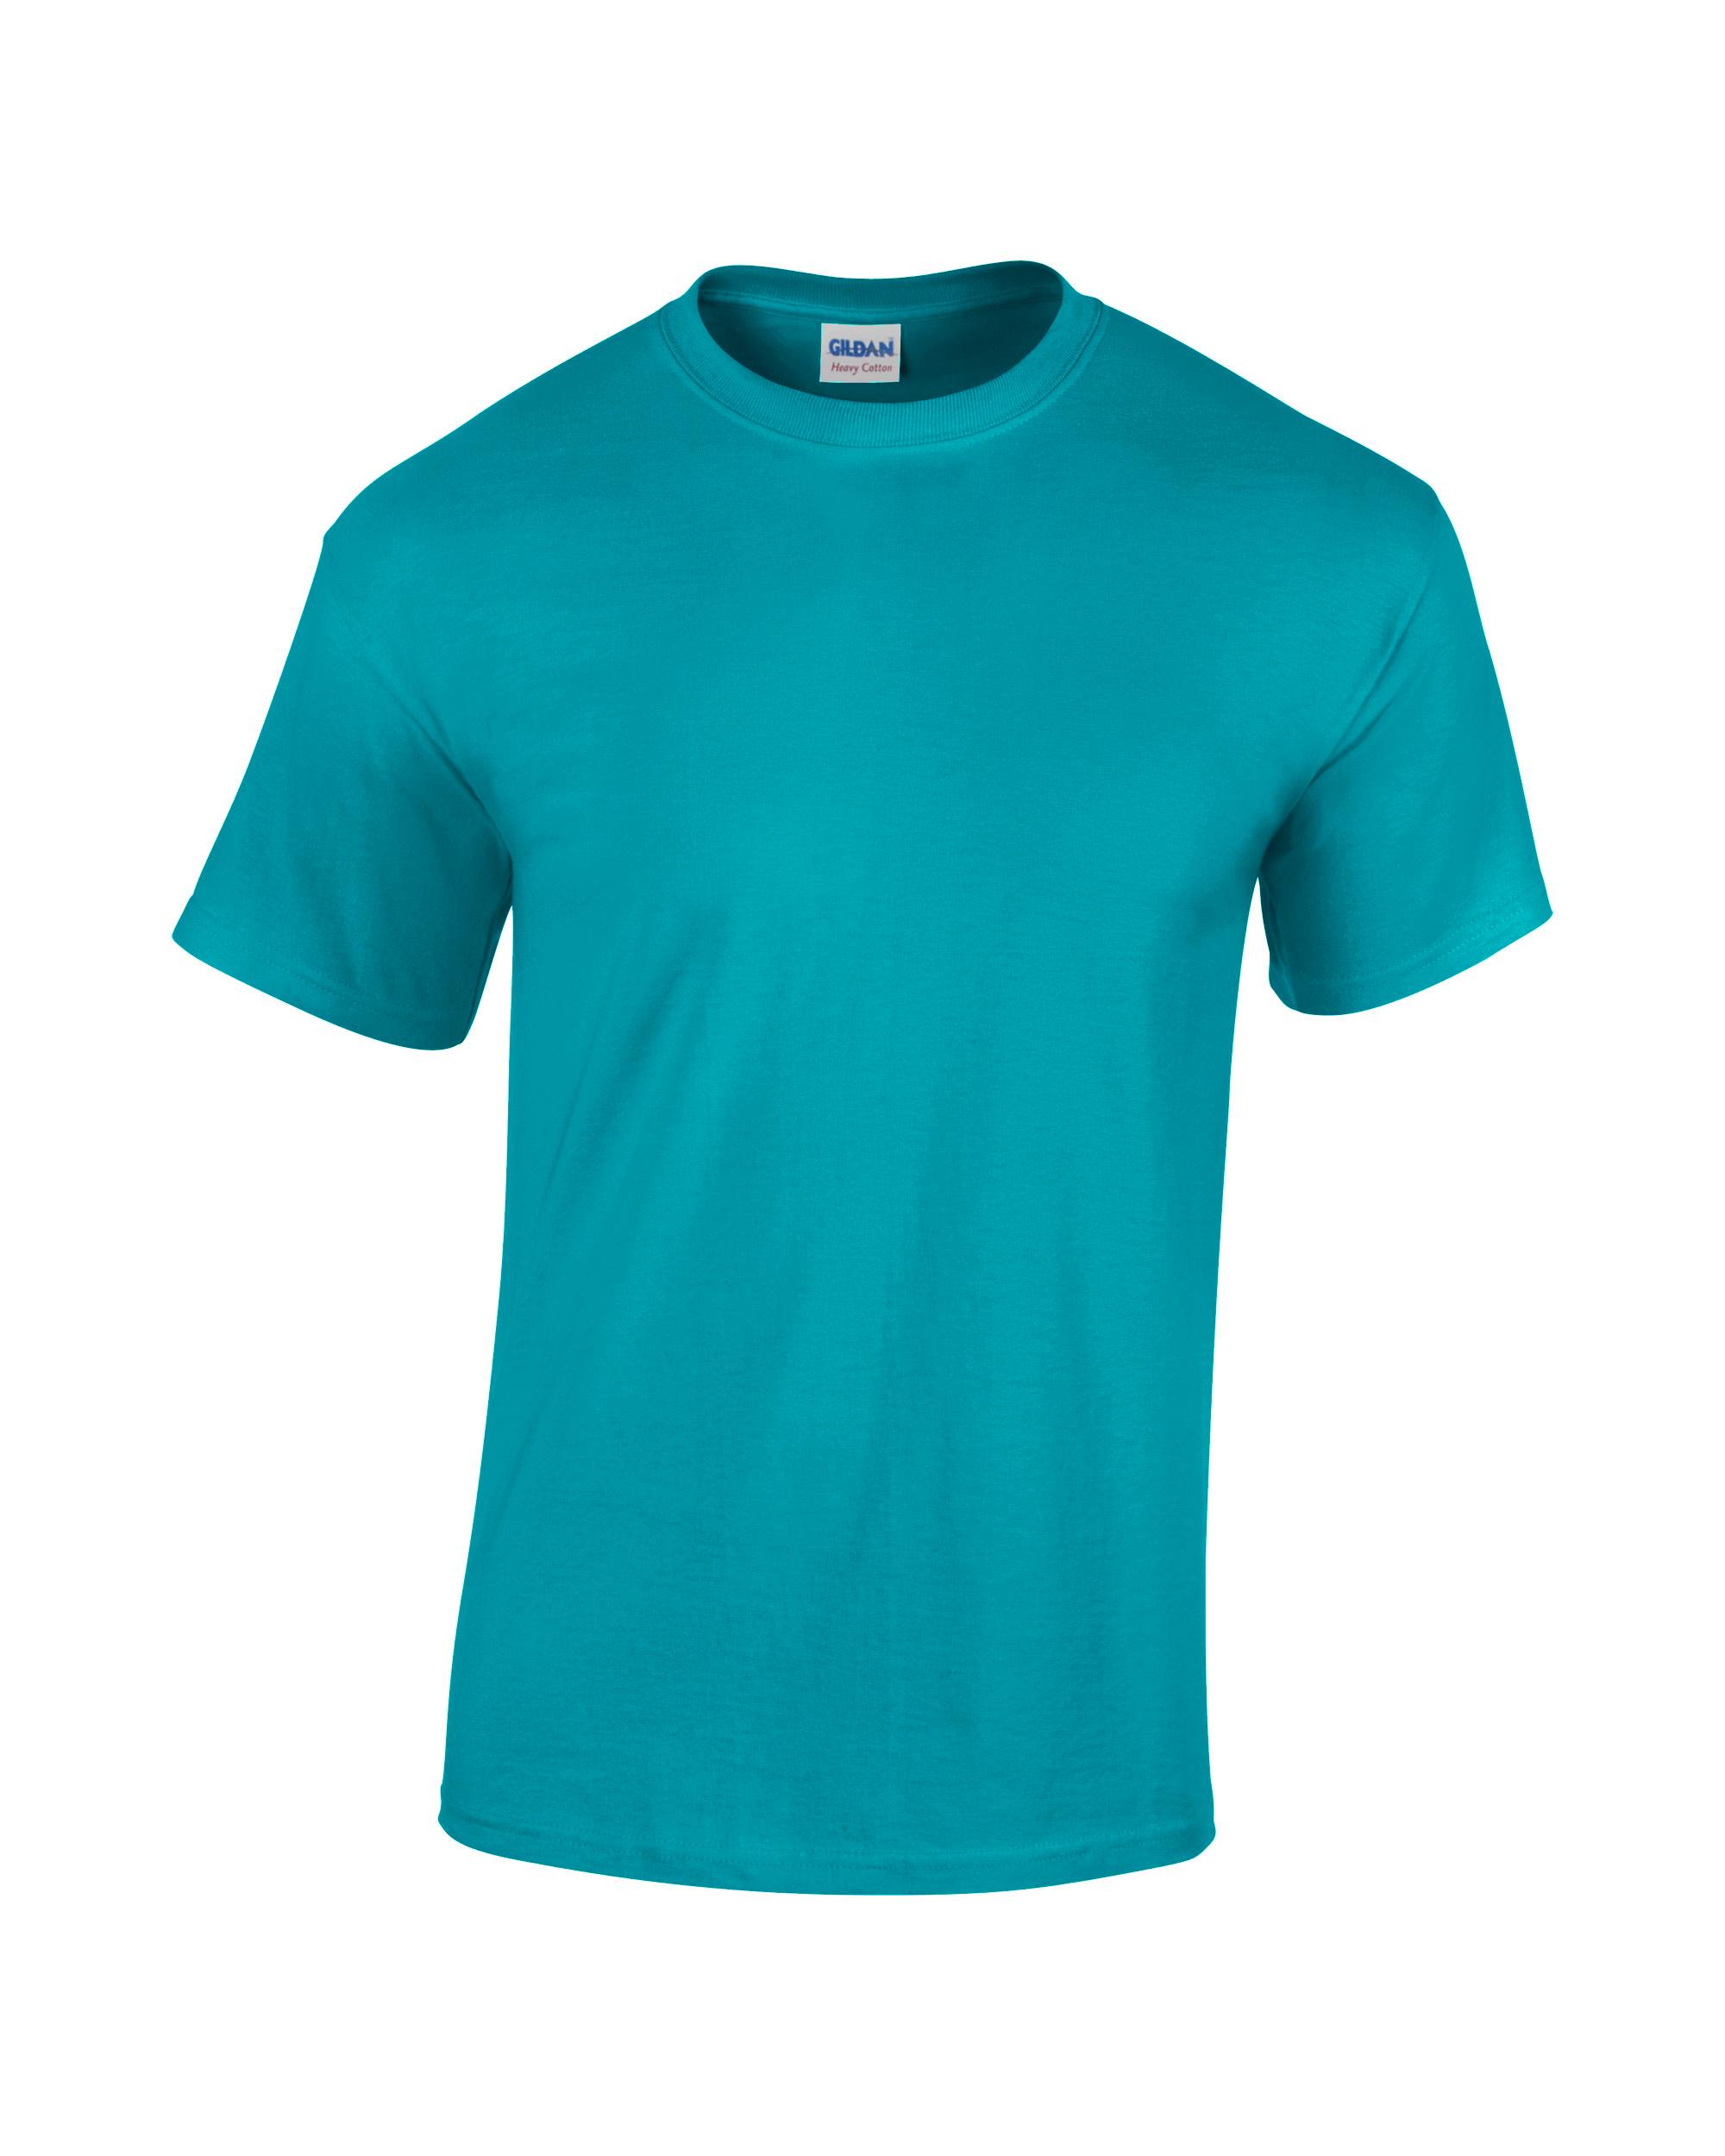 Shirt design for mens - 5000 7717c_jade Dome 5 3 Oz Heavy Cotton Mens Shirts Ladies Shirts